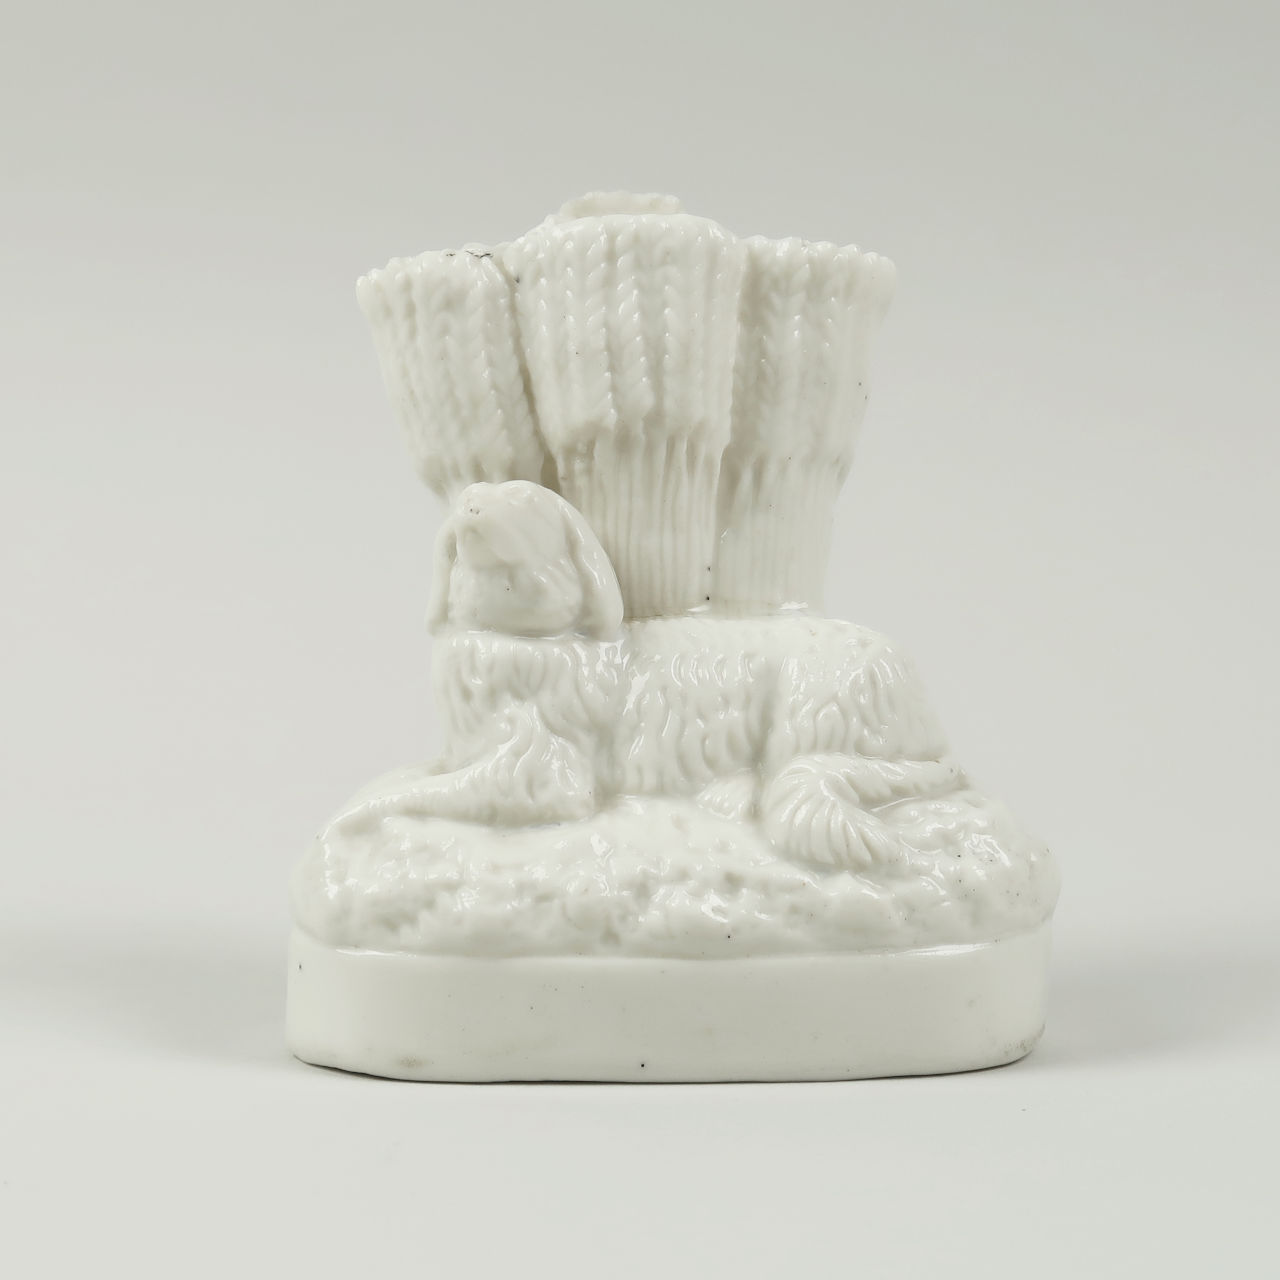 Bone China Spill Vase - Spaniel with Wheatsheaves